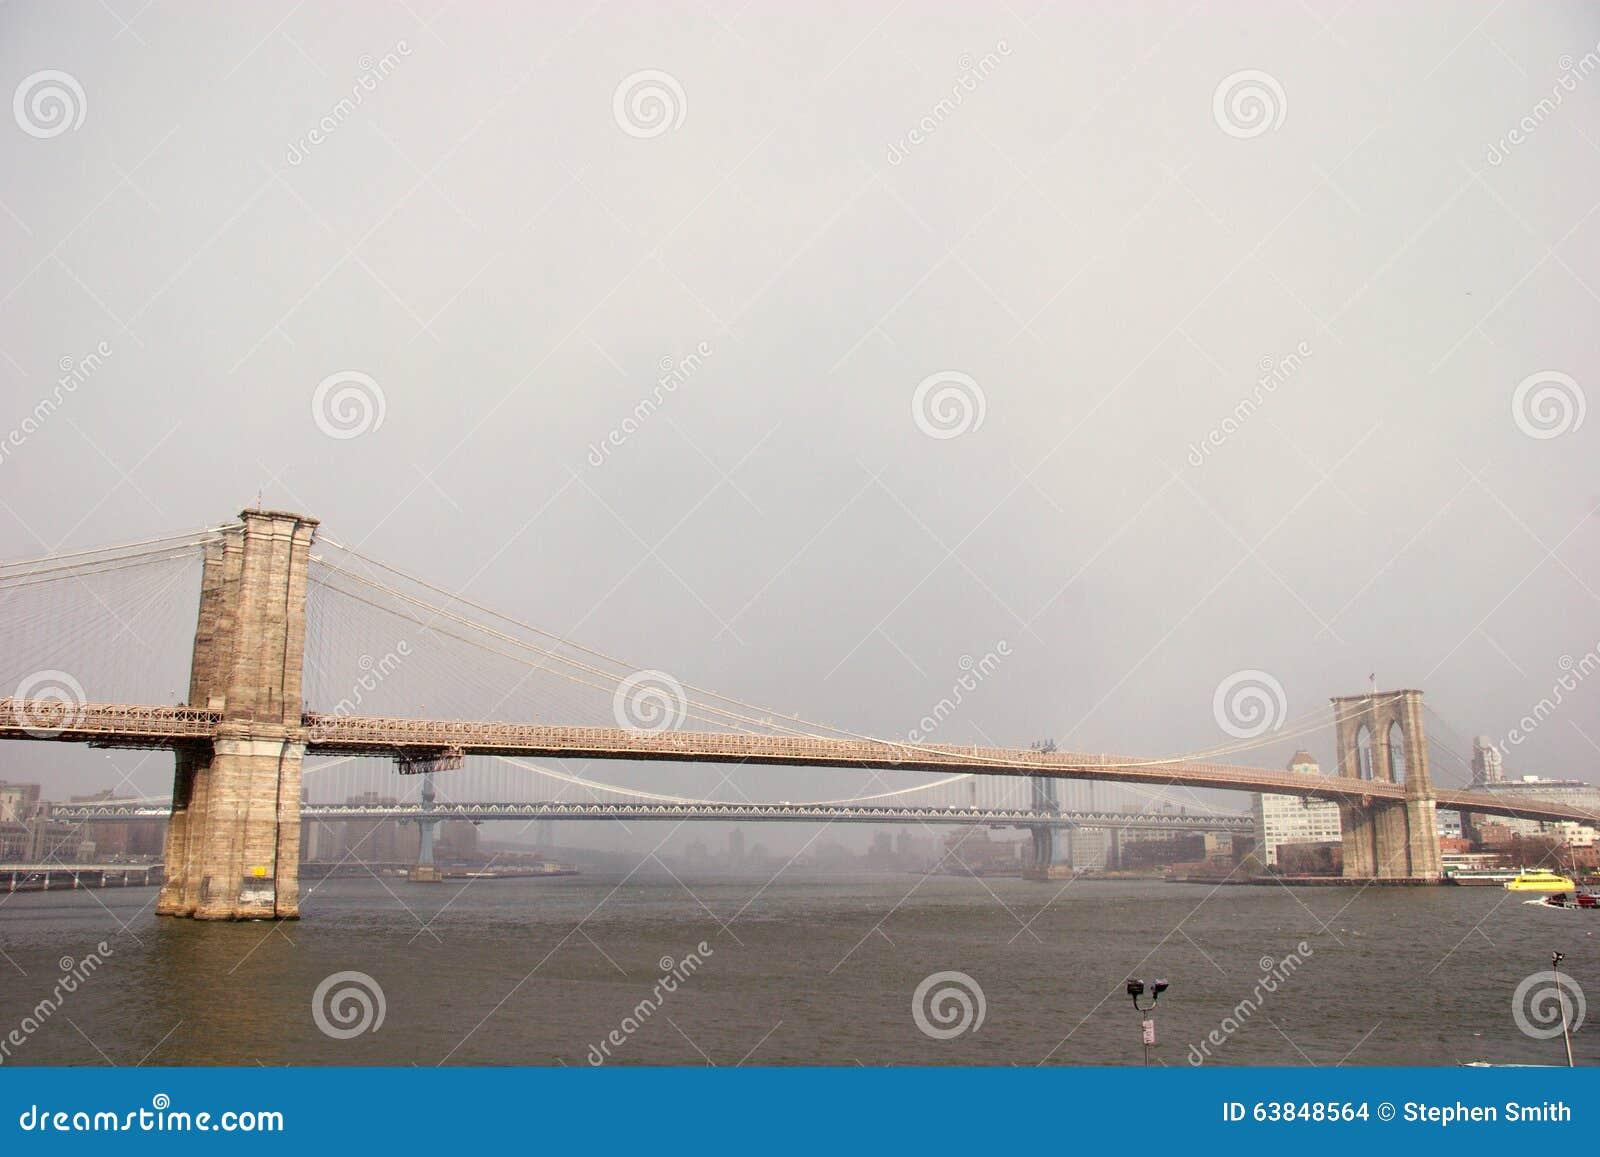 Wide view of Brooklyn Bridge with Manhattan Bridge behind